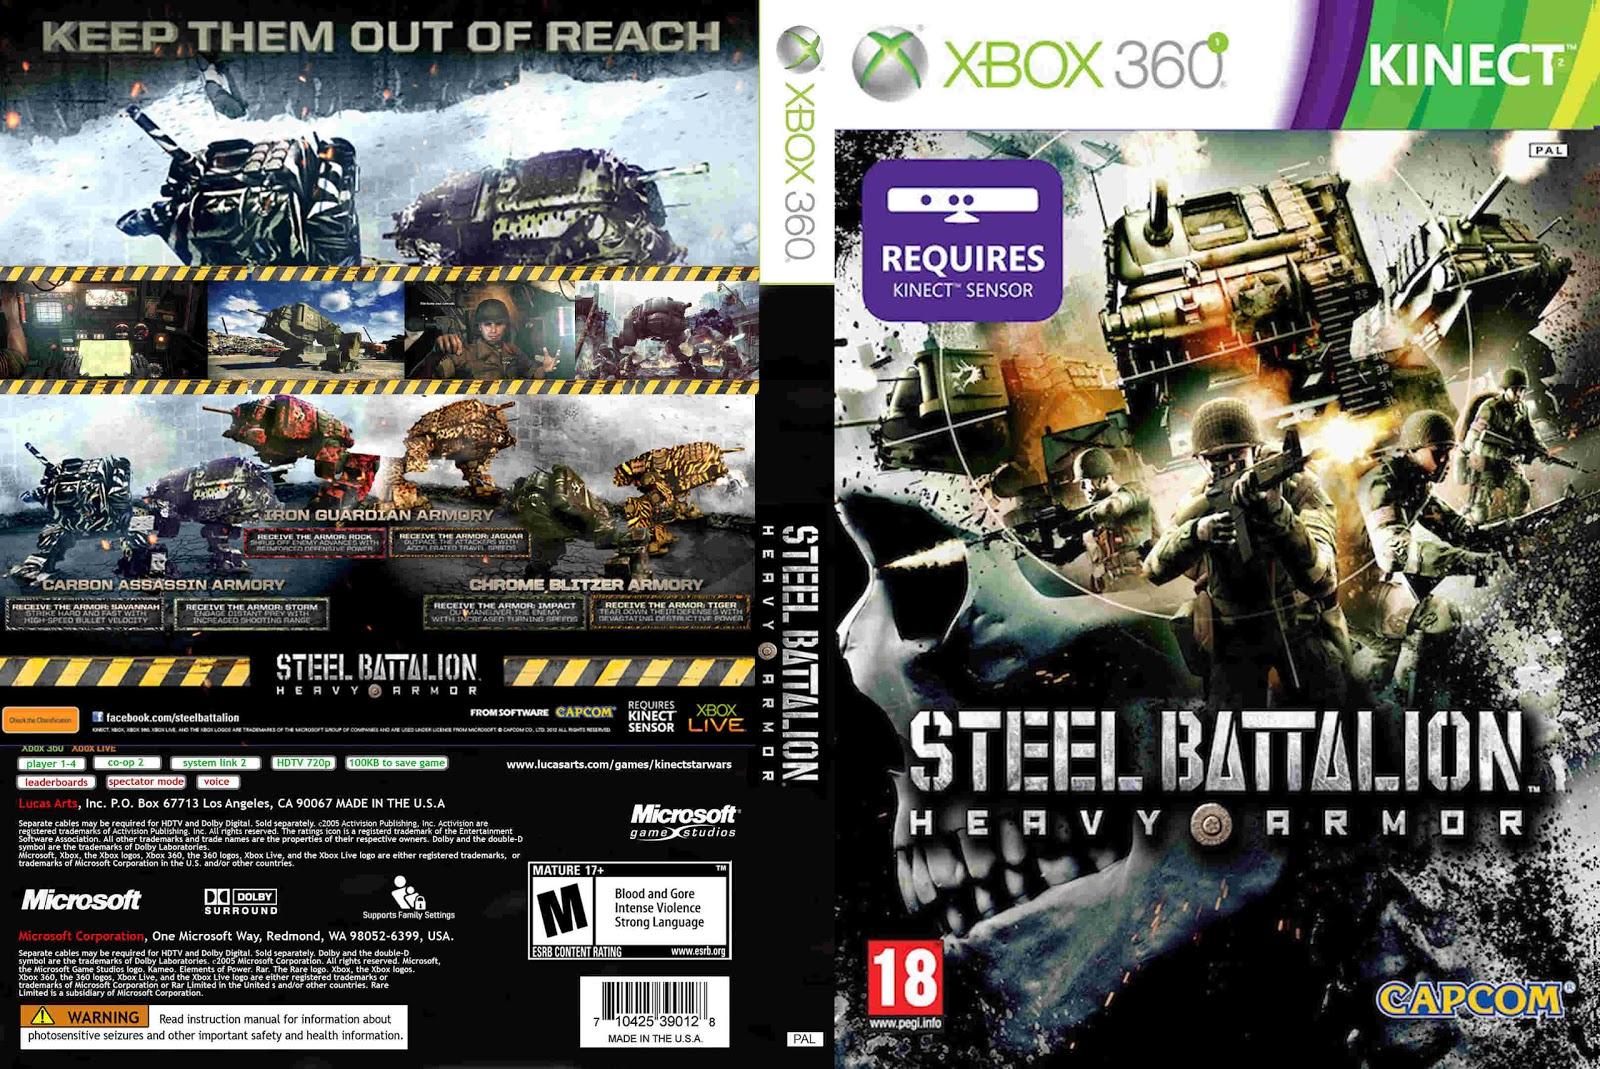 STEEL BATTALION HEAVY ARMOR / XBOX 360